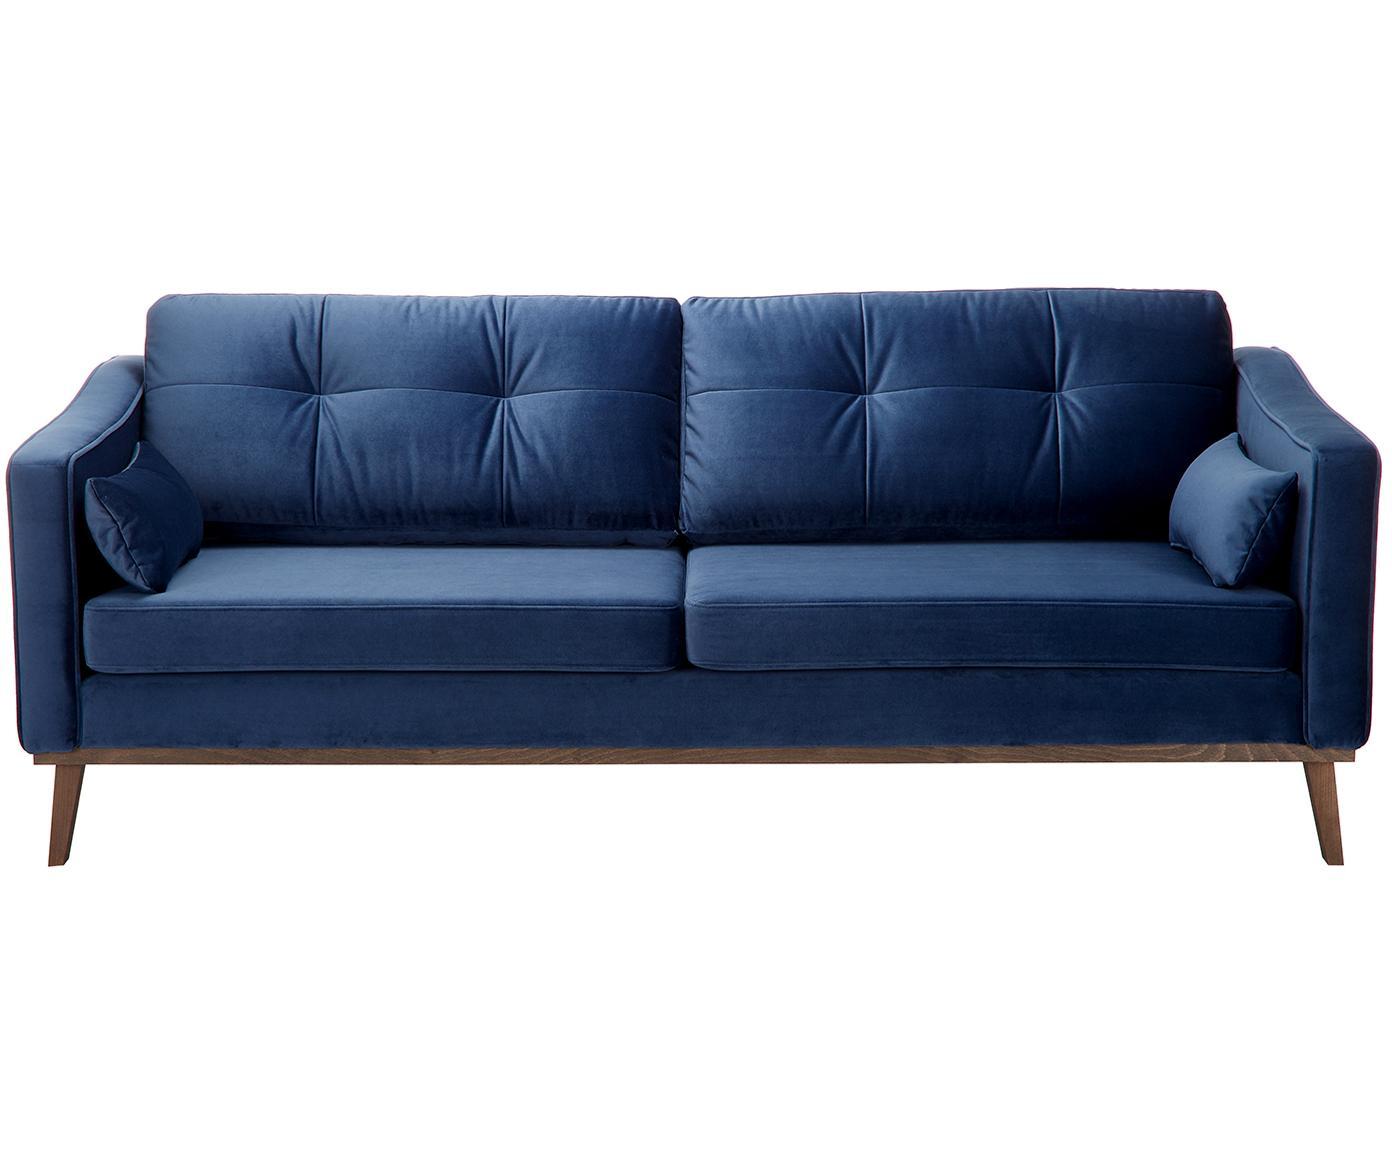 Samt-Sofa Alva (3-Sitzer), Bezug: Samt (Hochwertiger Polyes, Gestell: Massives Kiefernholz, Füße: Massives Buchenholz, gebe, Samt Dunkelblau, B 215 x T 92 cm